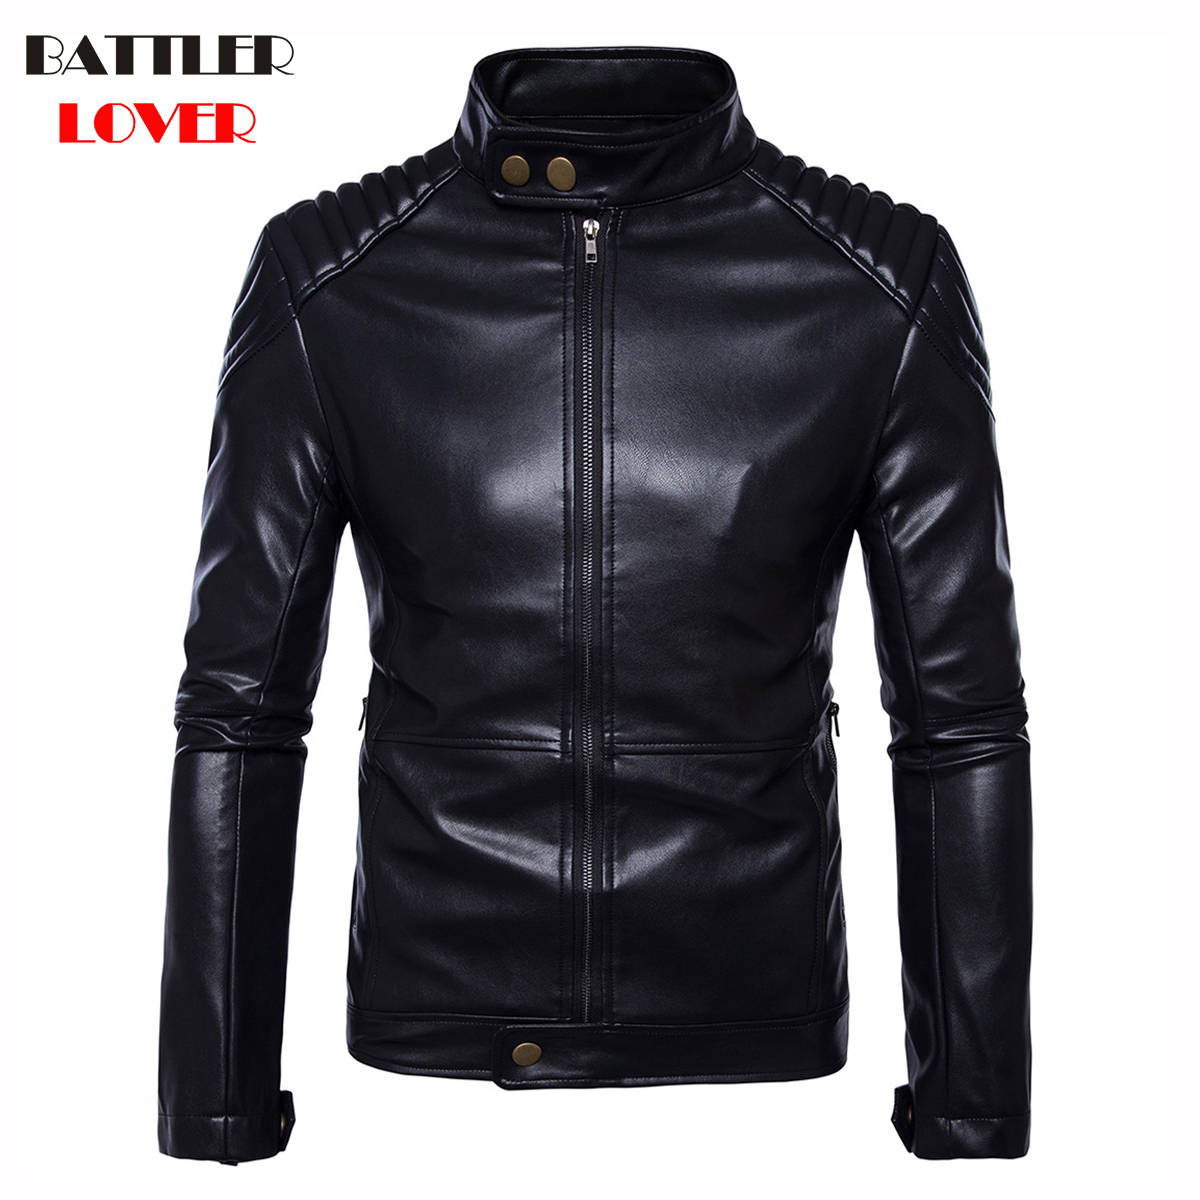 2019 Mens Leather Coat Winter Faux Leather Warm Outwear Coats Men Punk Biker Parka Jackets Hombre Thick Overcoat Brand Clothing